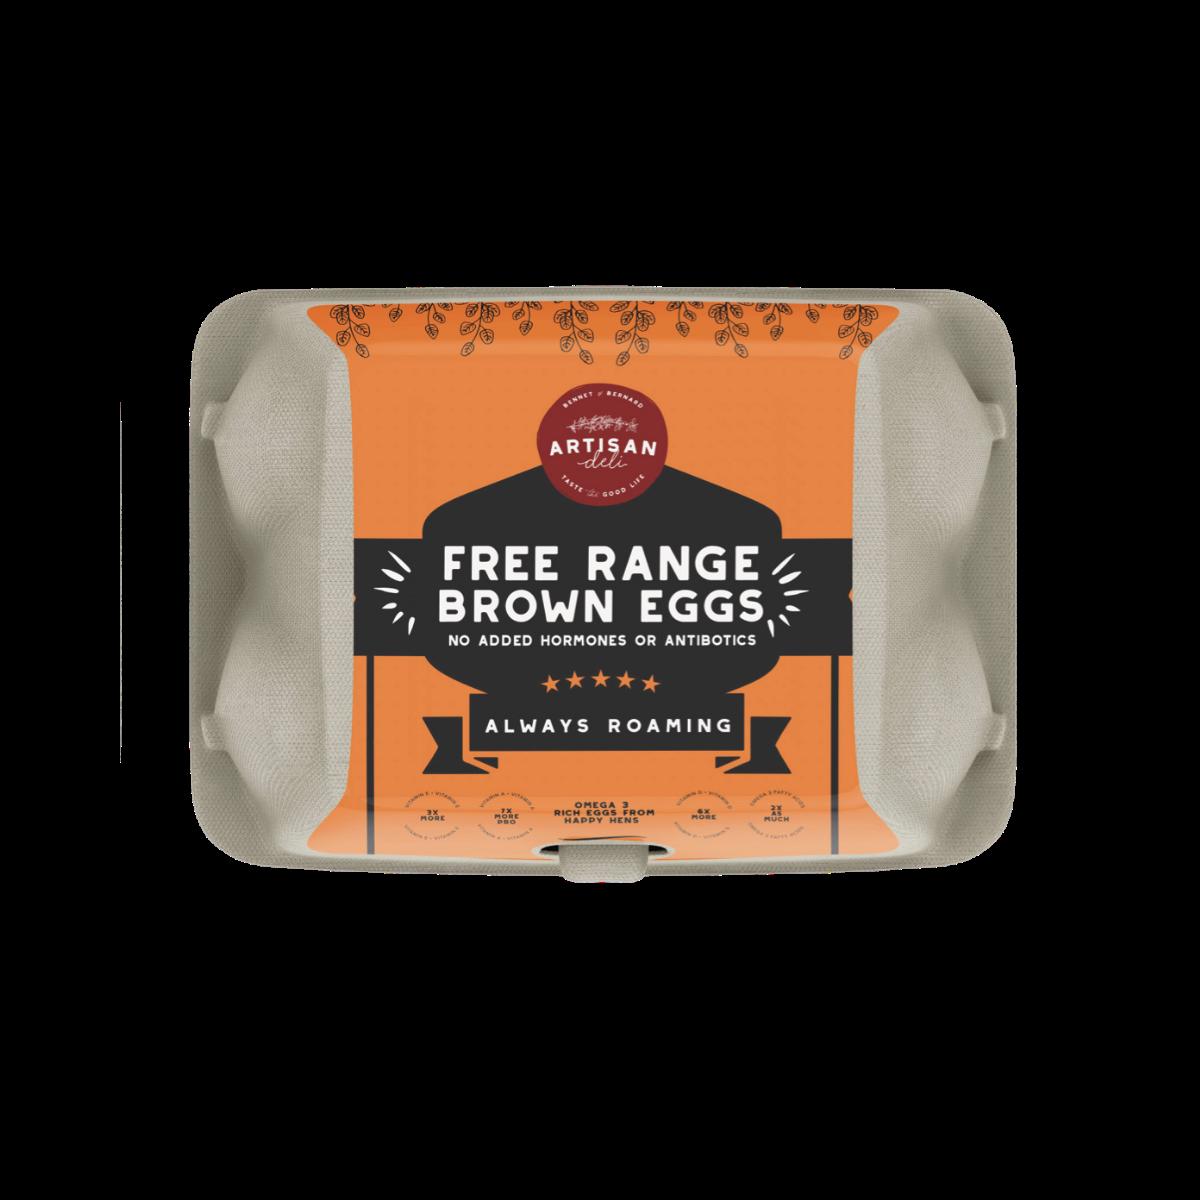 Free Range Brown Eggs by Artisan Deli – Pack of 6